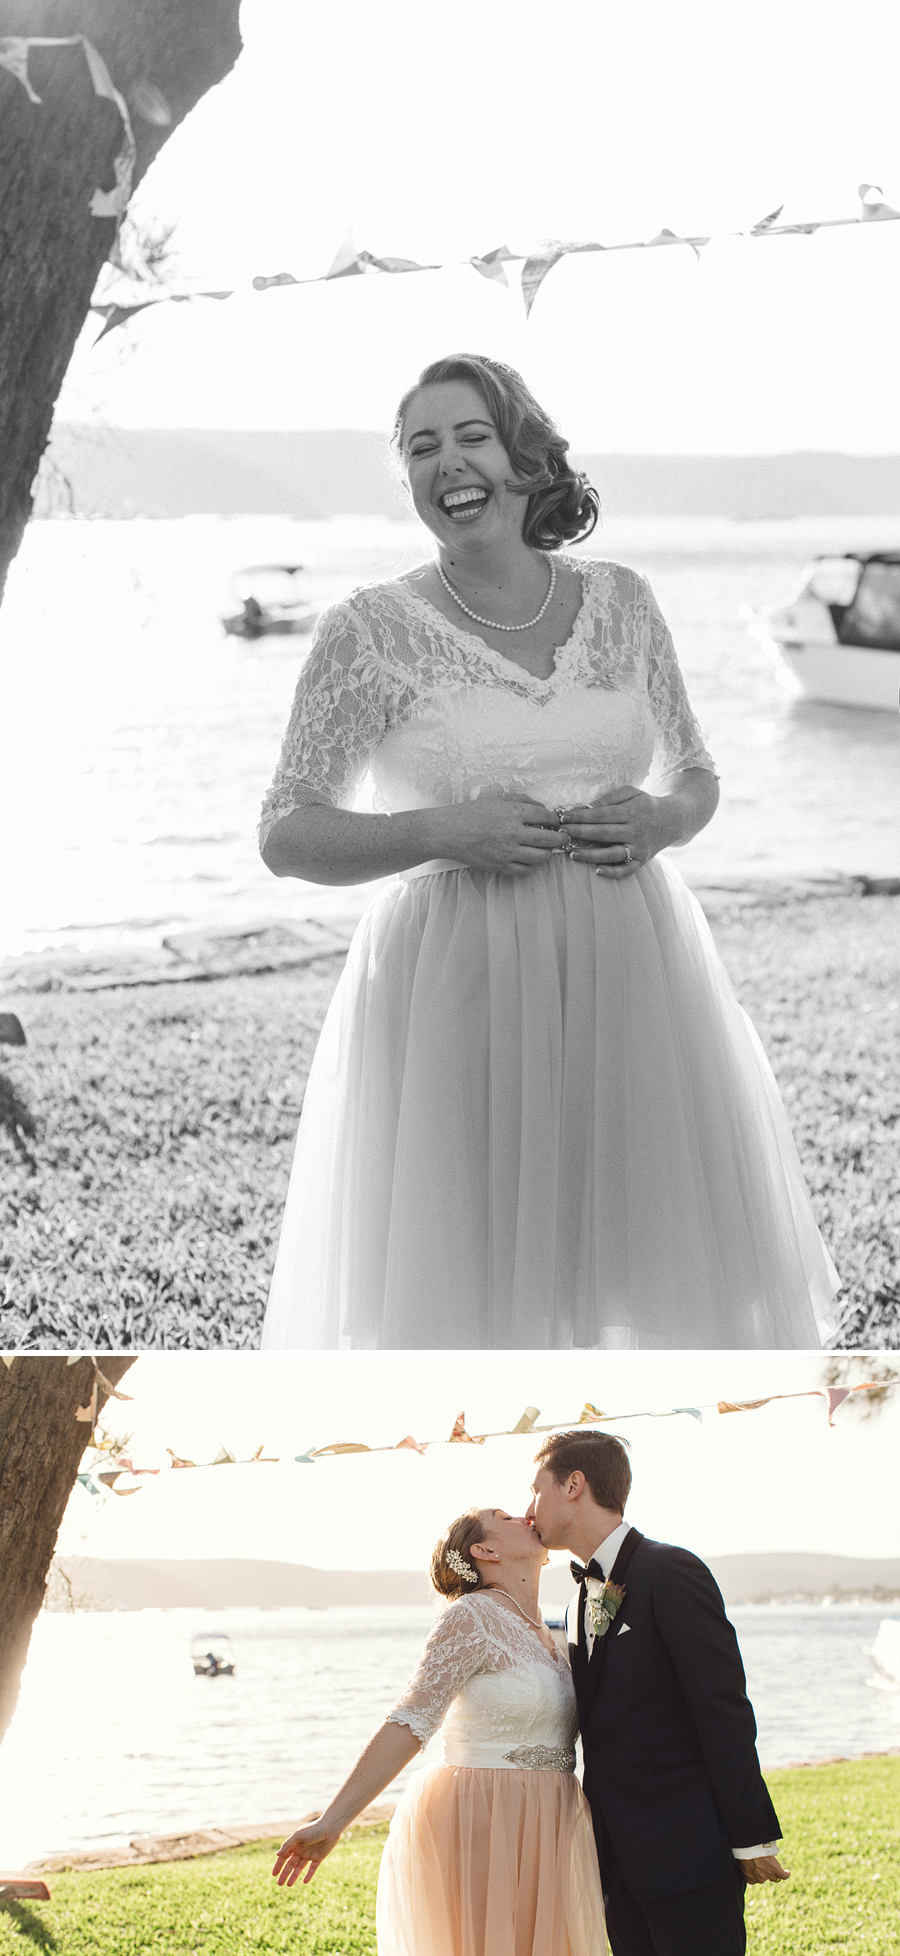 North Shore Wedding Photographer:Bride & Groom portraits